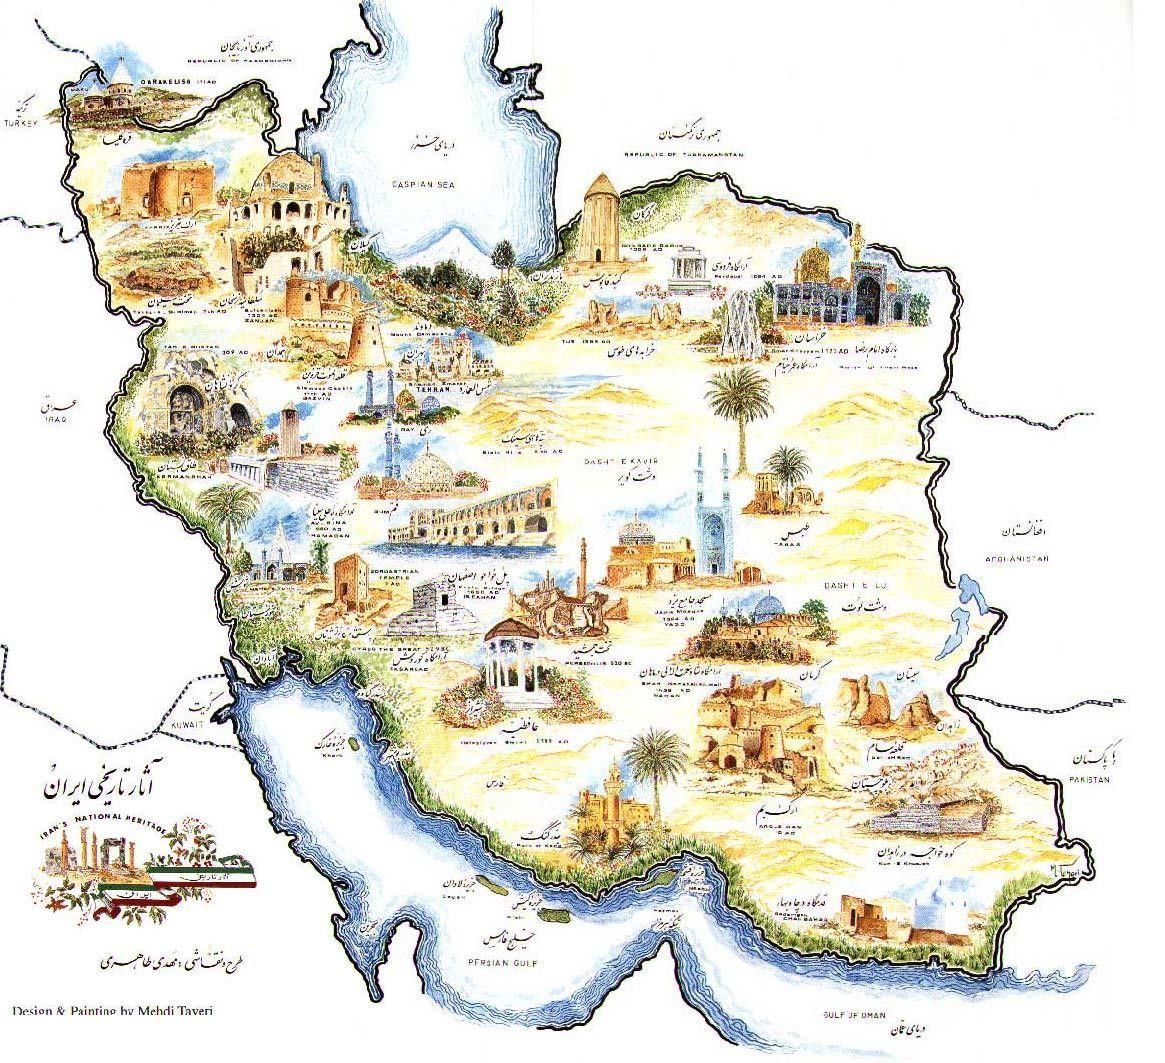 Iran Tourism Iran Tourism In 2020 Samara Naher Osten Tourismus